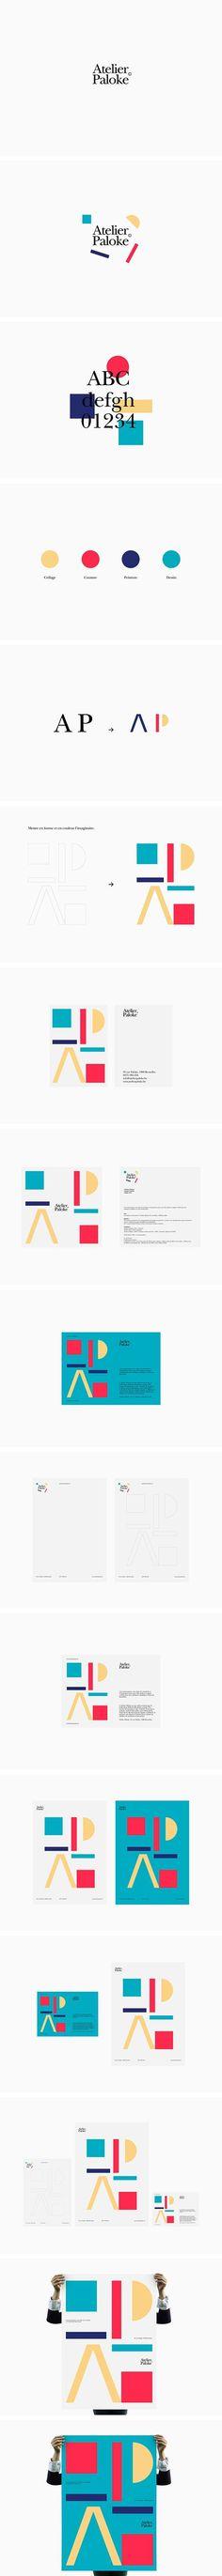 Atelier Paloke, playful geometry